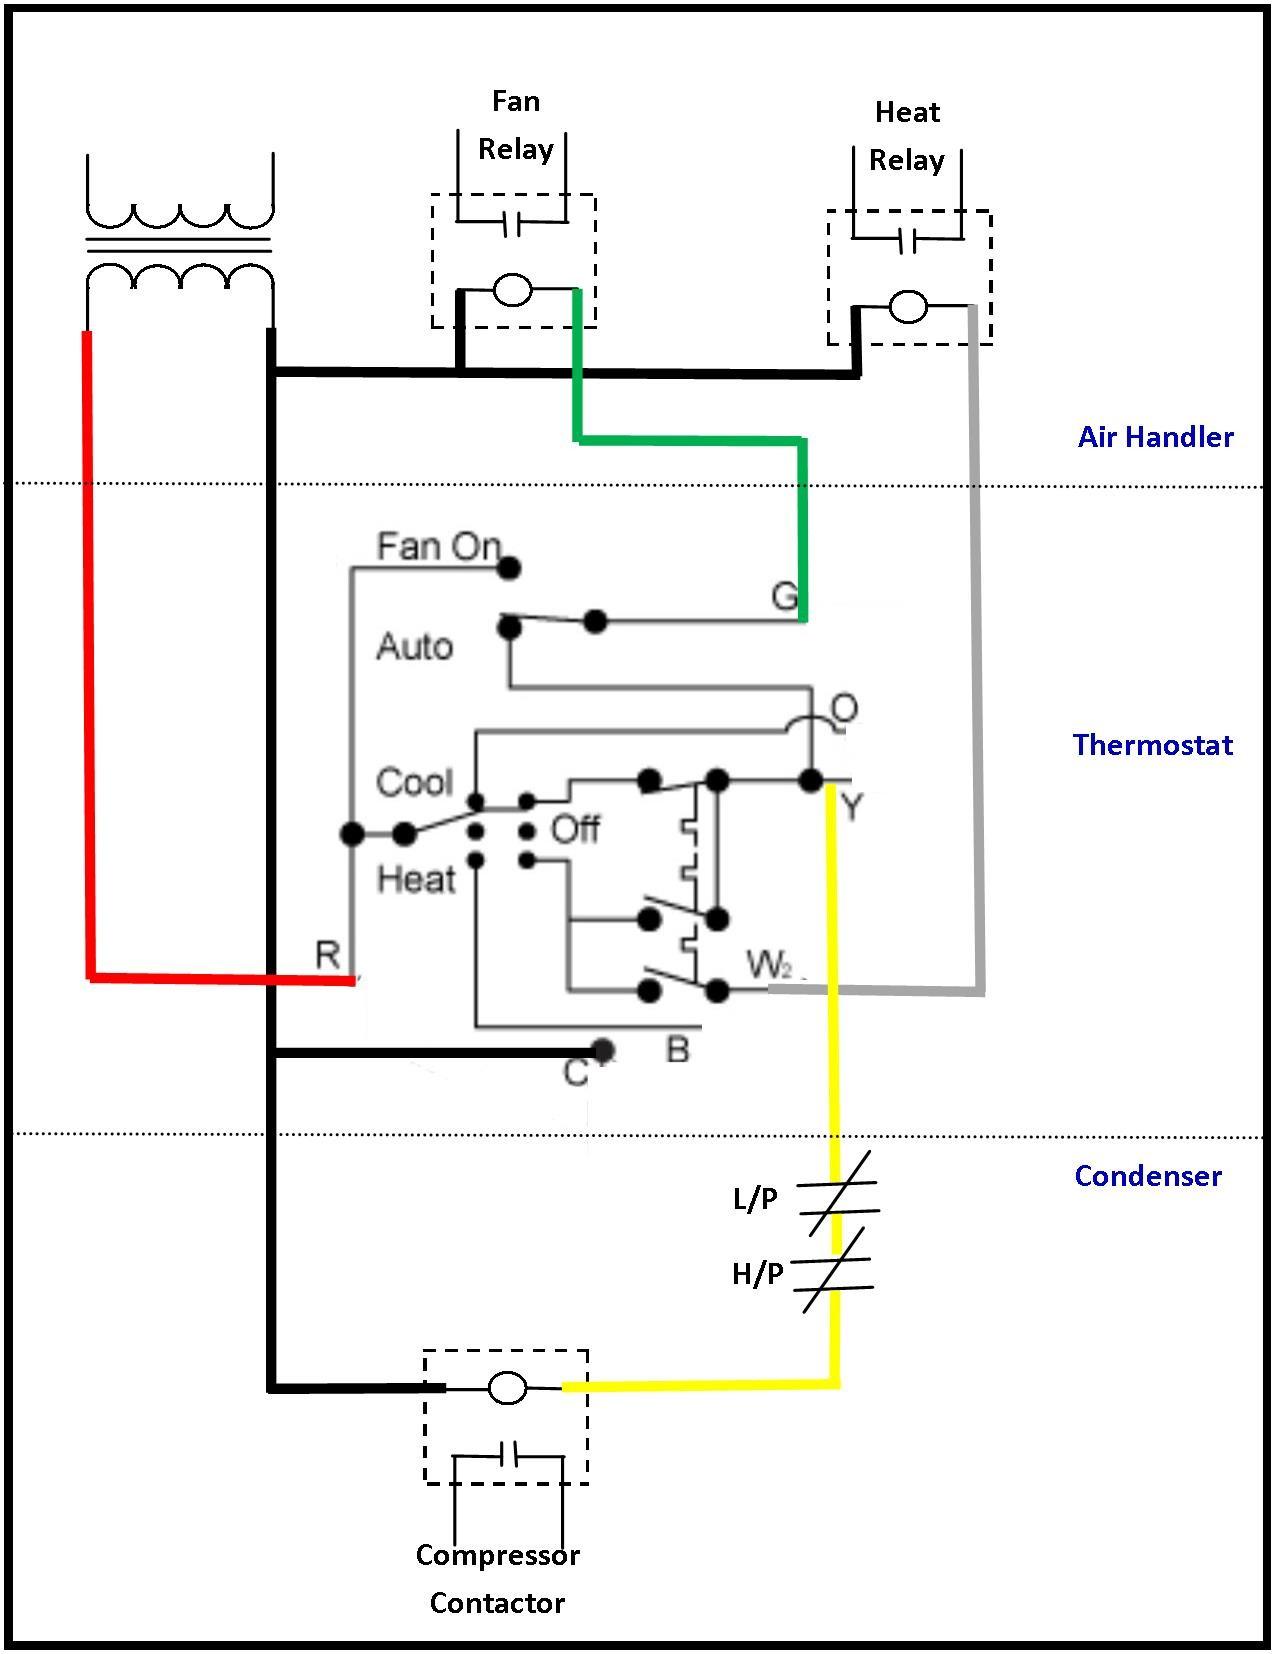 ac low voltage wiring diagram my wiring diagram rh detoxicrecenze com generator voltage regulator wiring diagram dual voltage motor wiring diagram